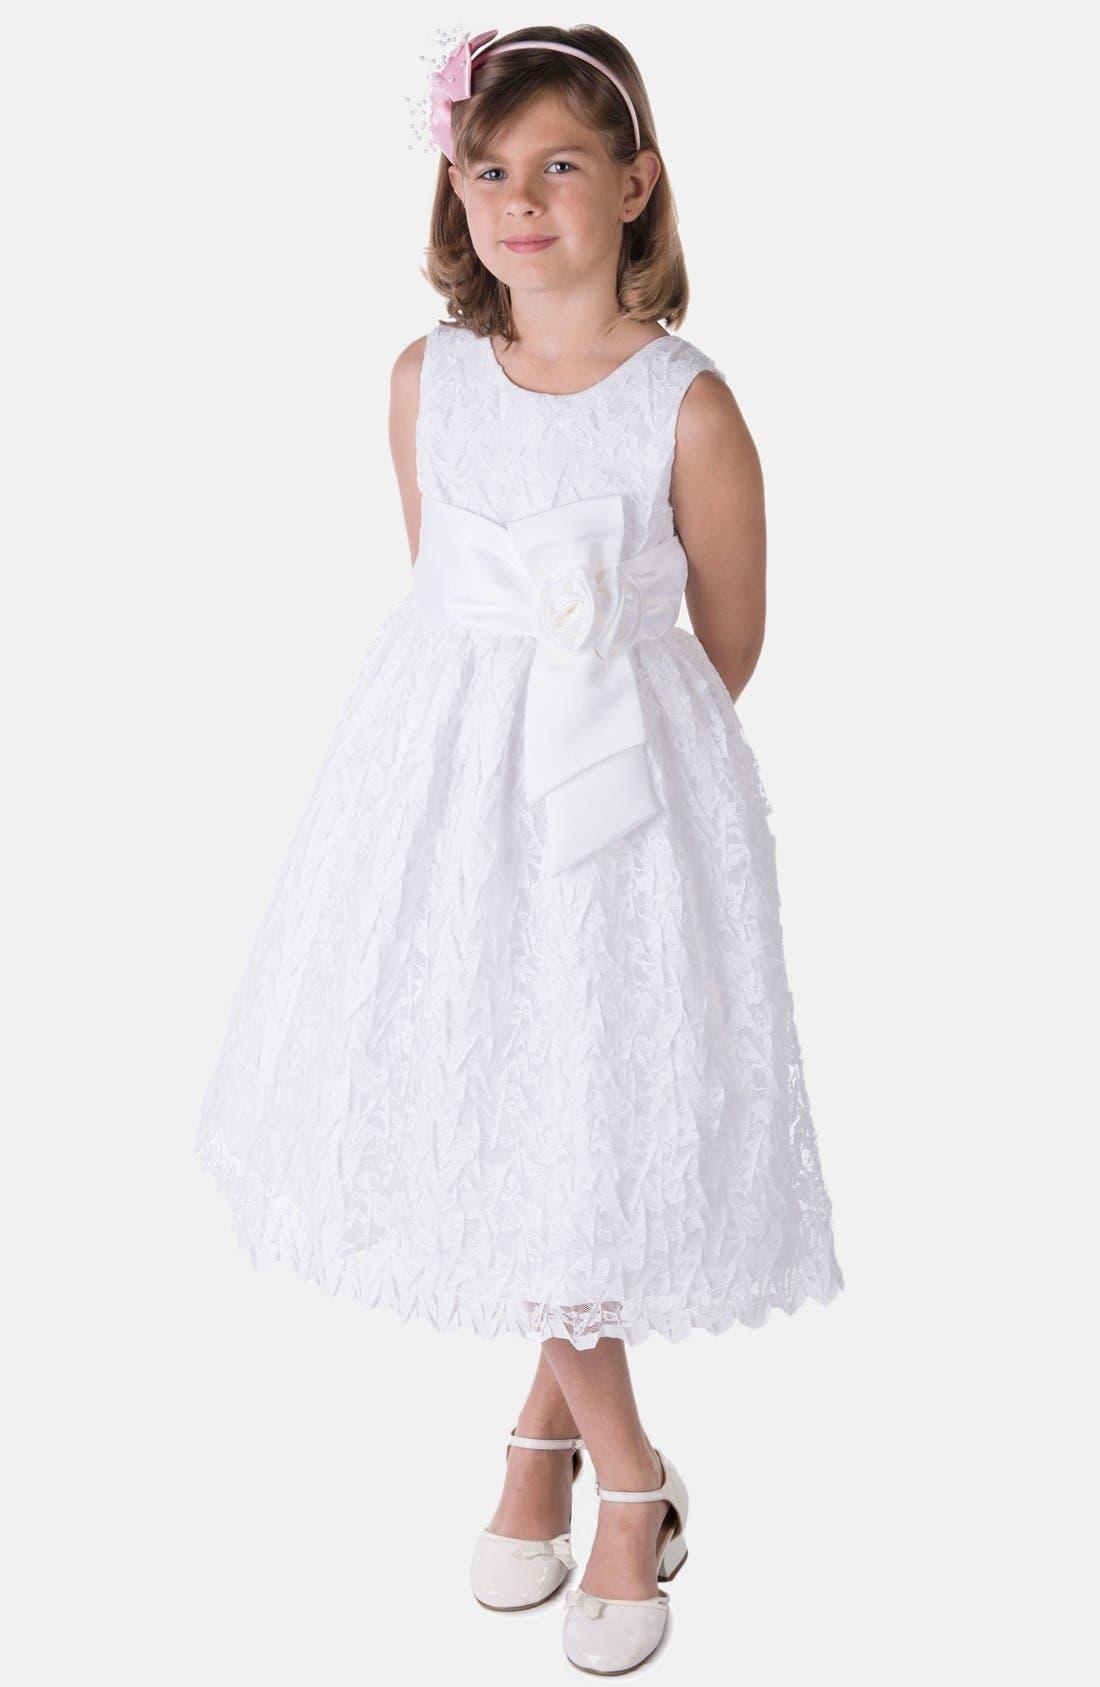 C.I. Castro & Co. Sleeveless Lace Dress,                             Main thumbnail 1, color,                             White